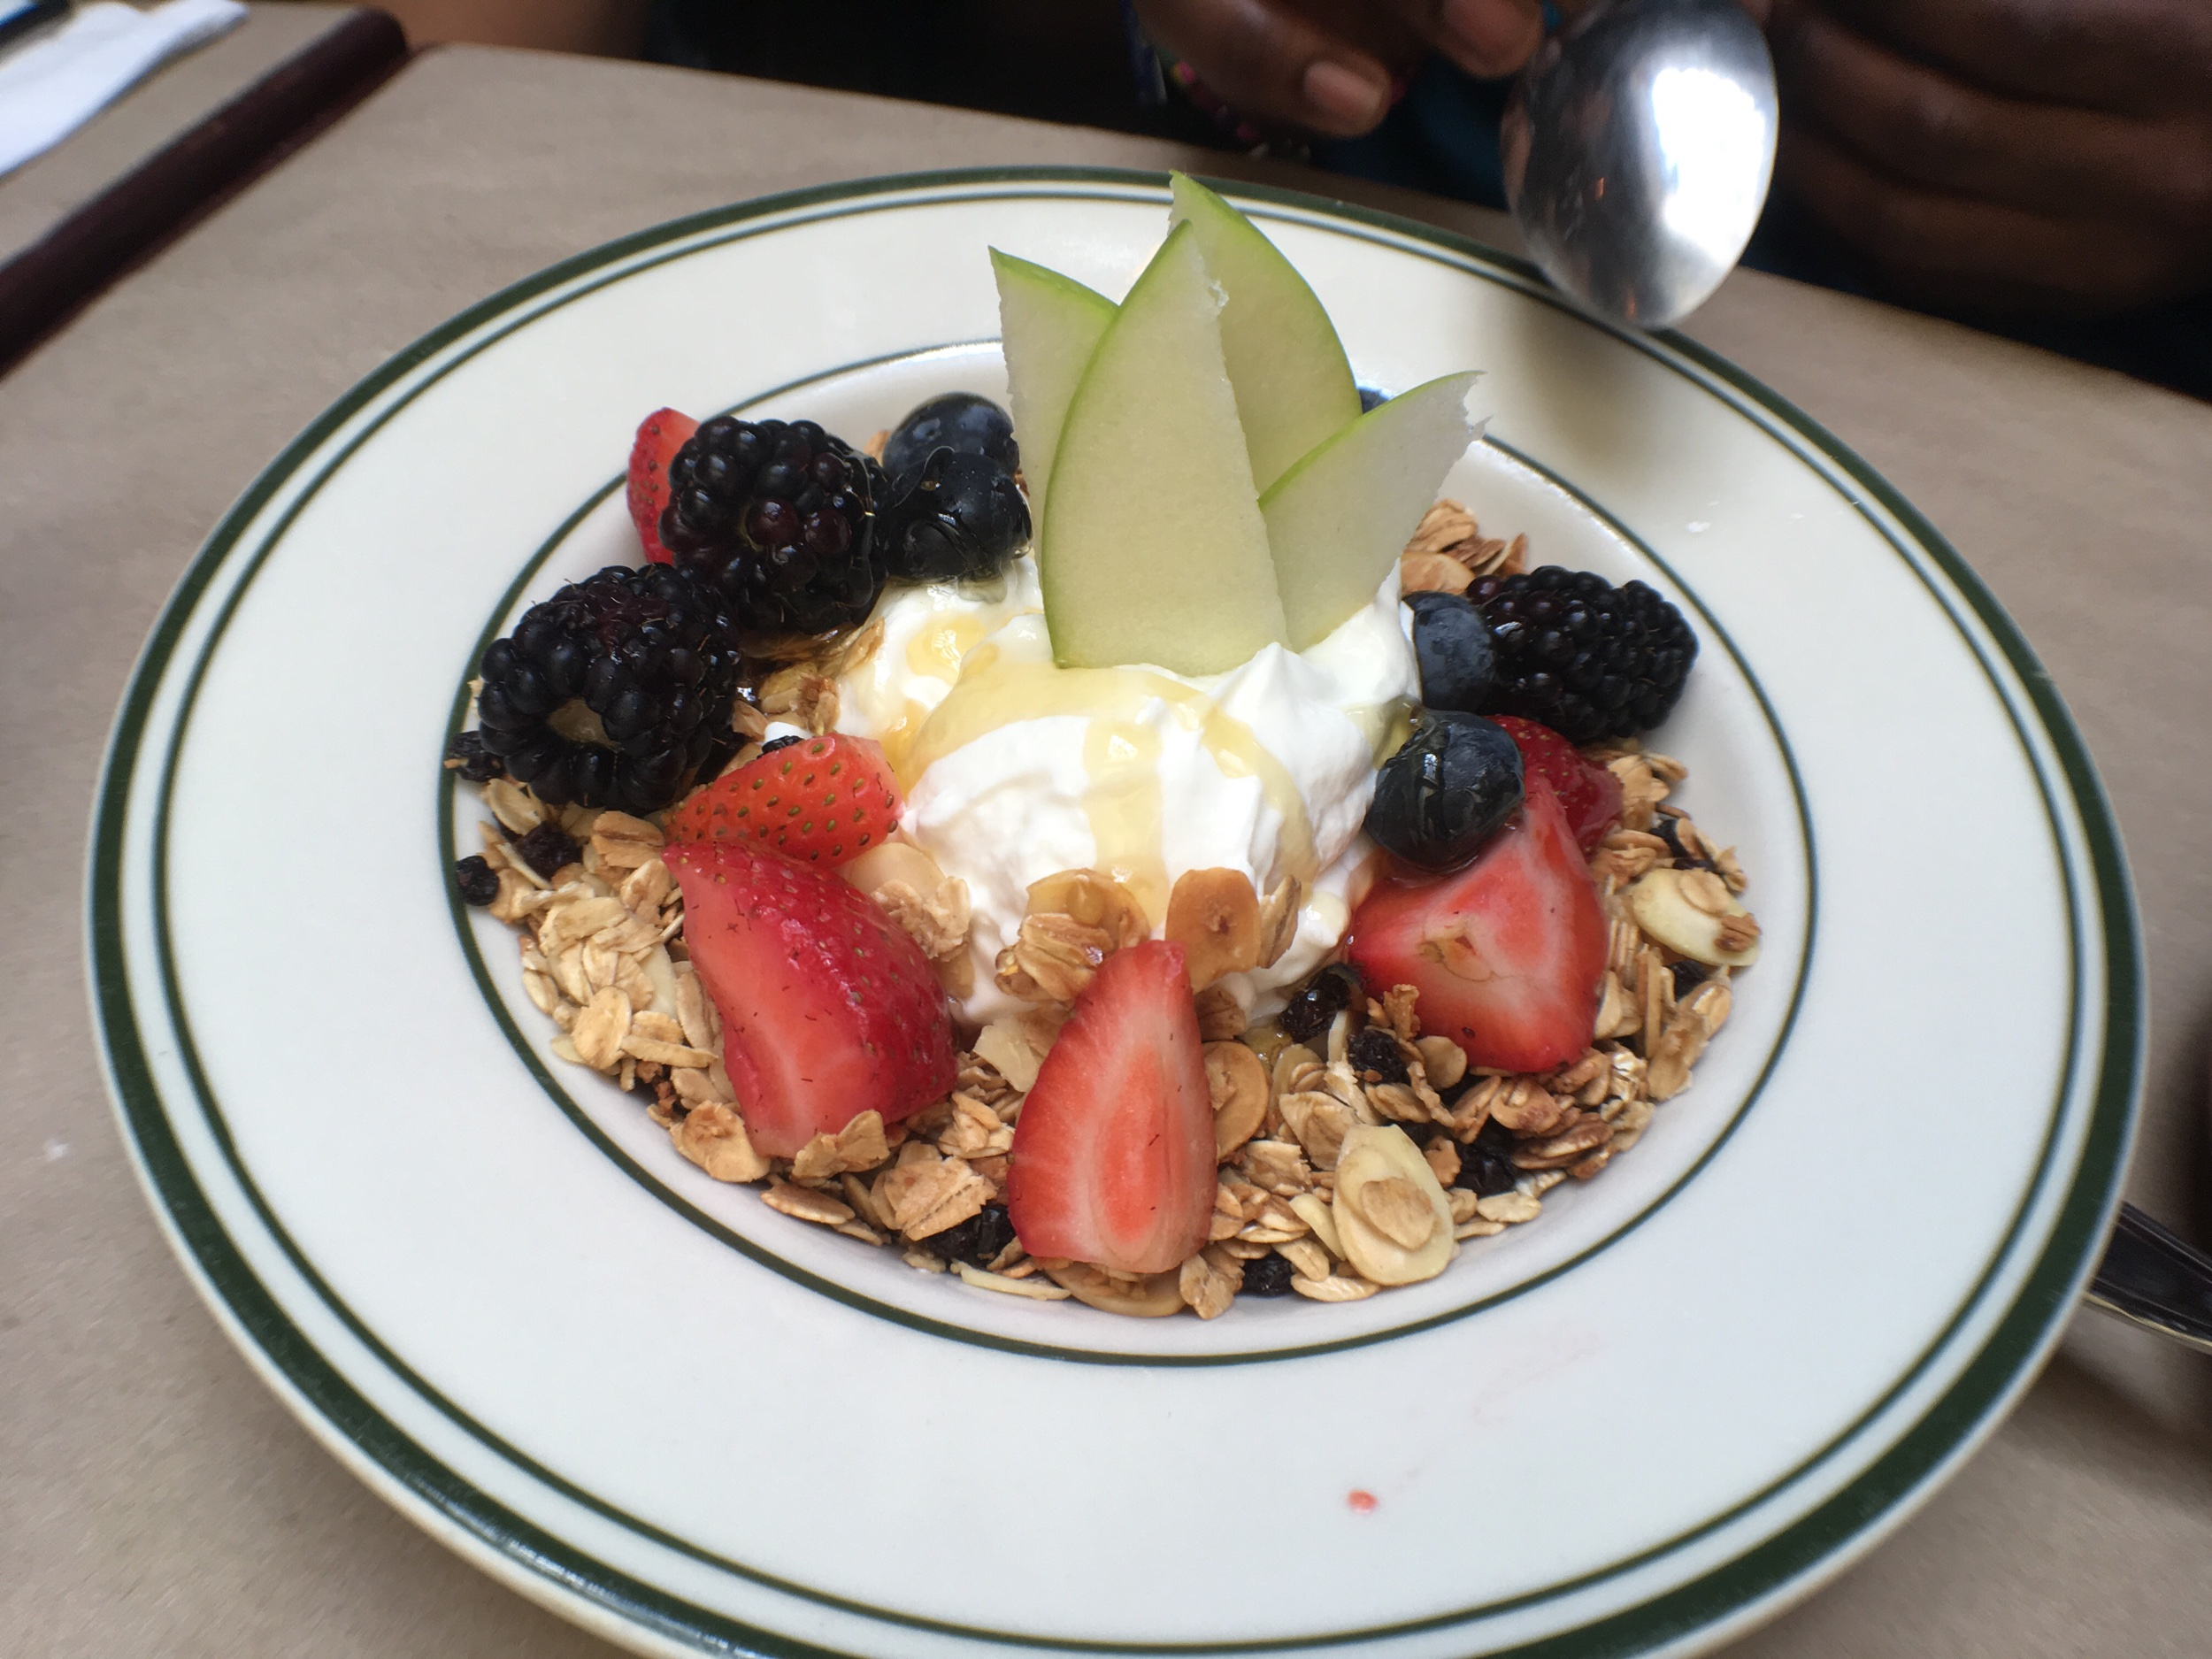 Fruit bowl with granola and yogurt